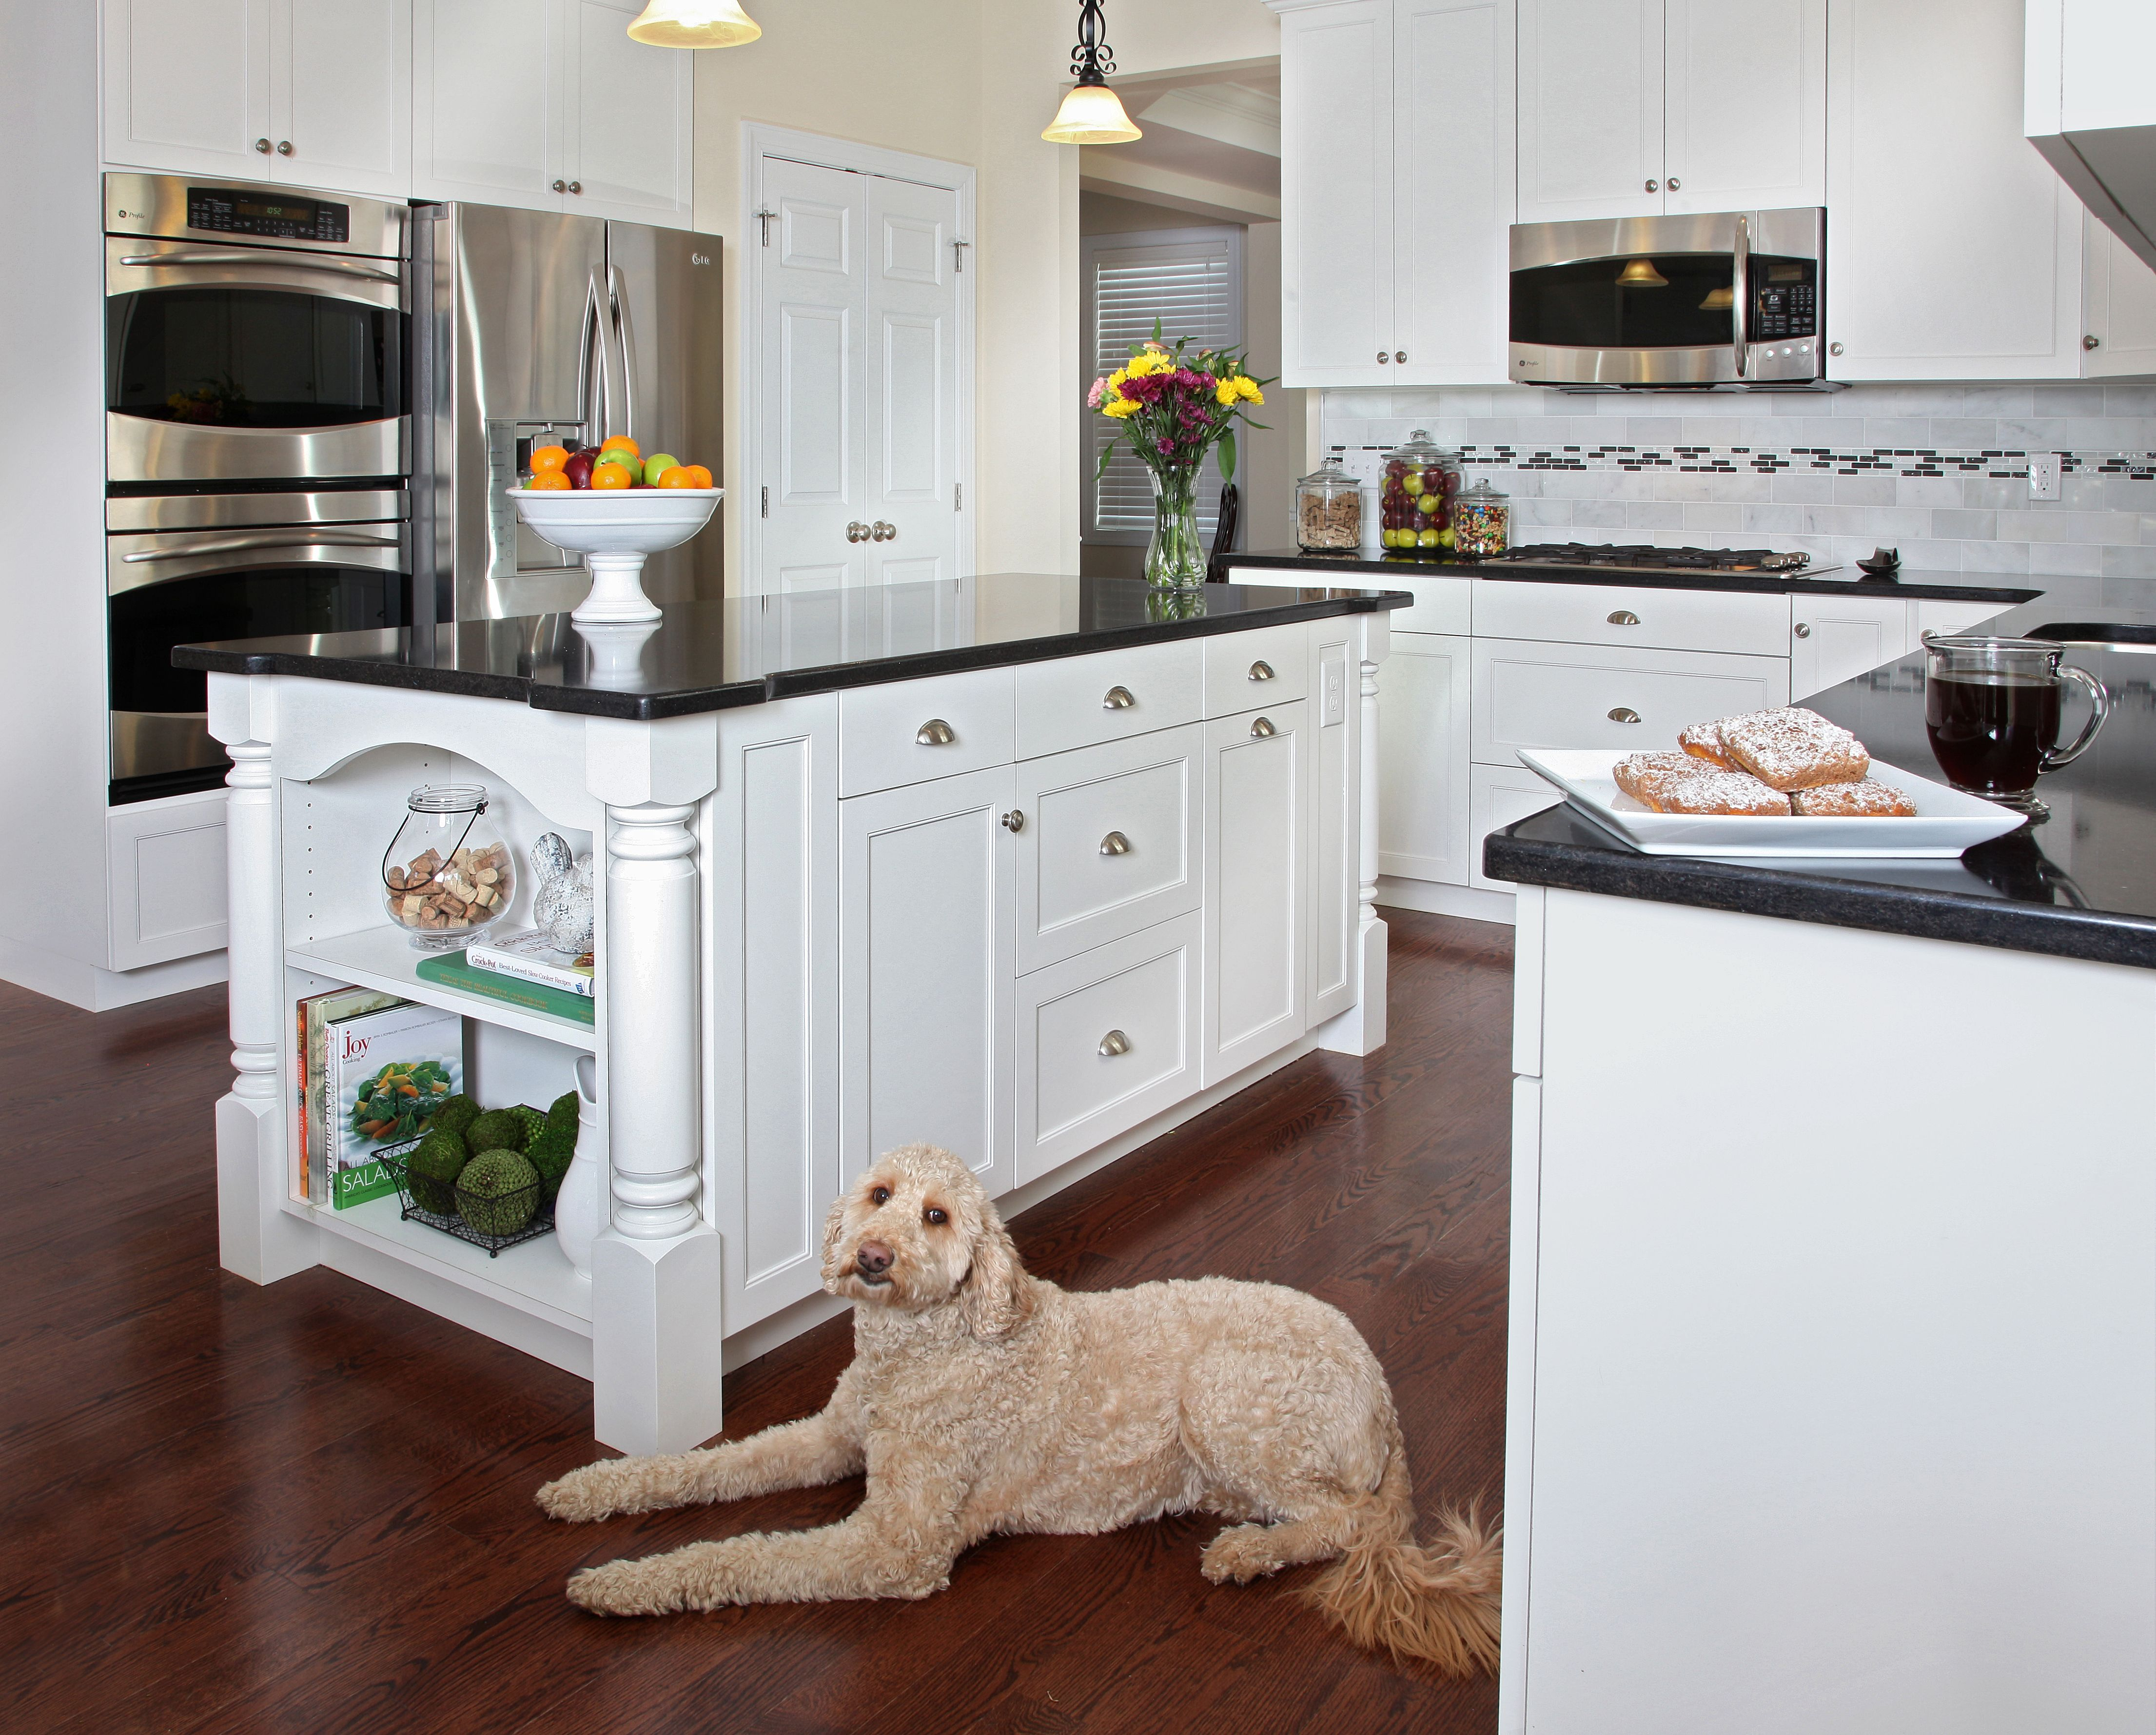 White Kitchens: 4 Ways to Make White Cabinets Work | Comebacks ...